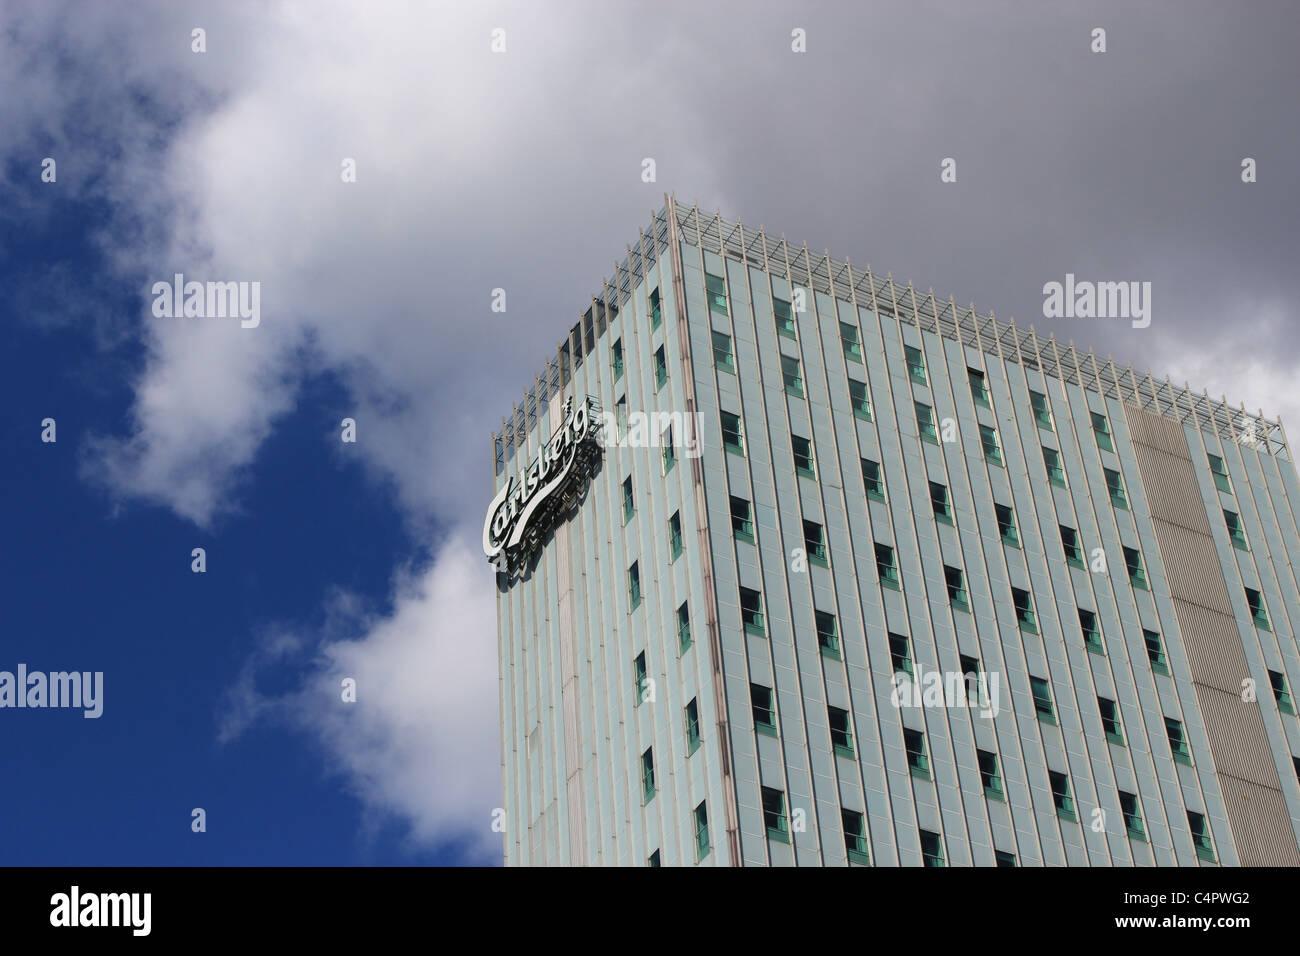 Carlsberg Group headquarters at Valby, Copenhagen. - Stock Image